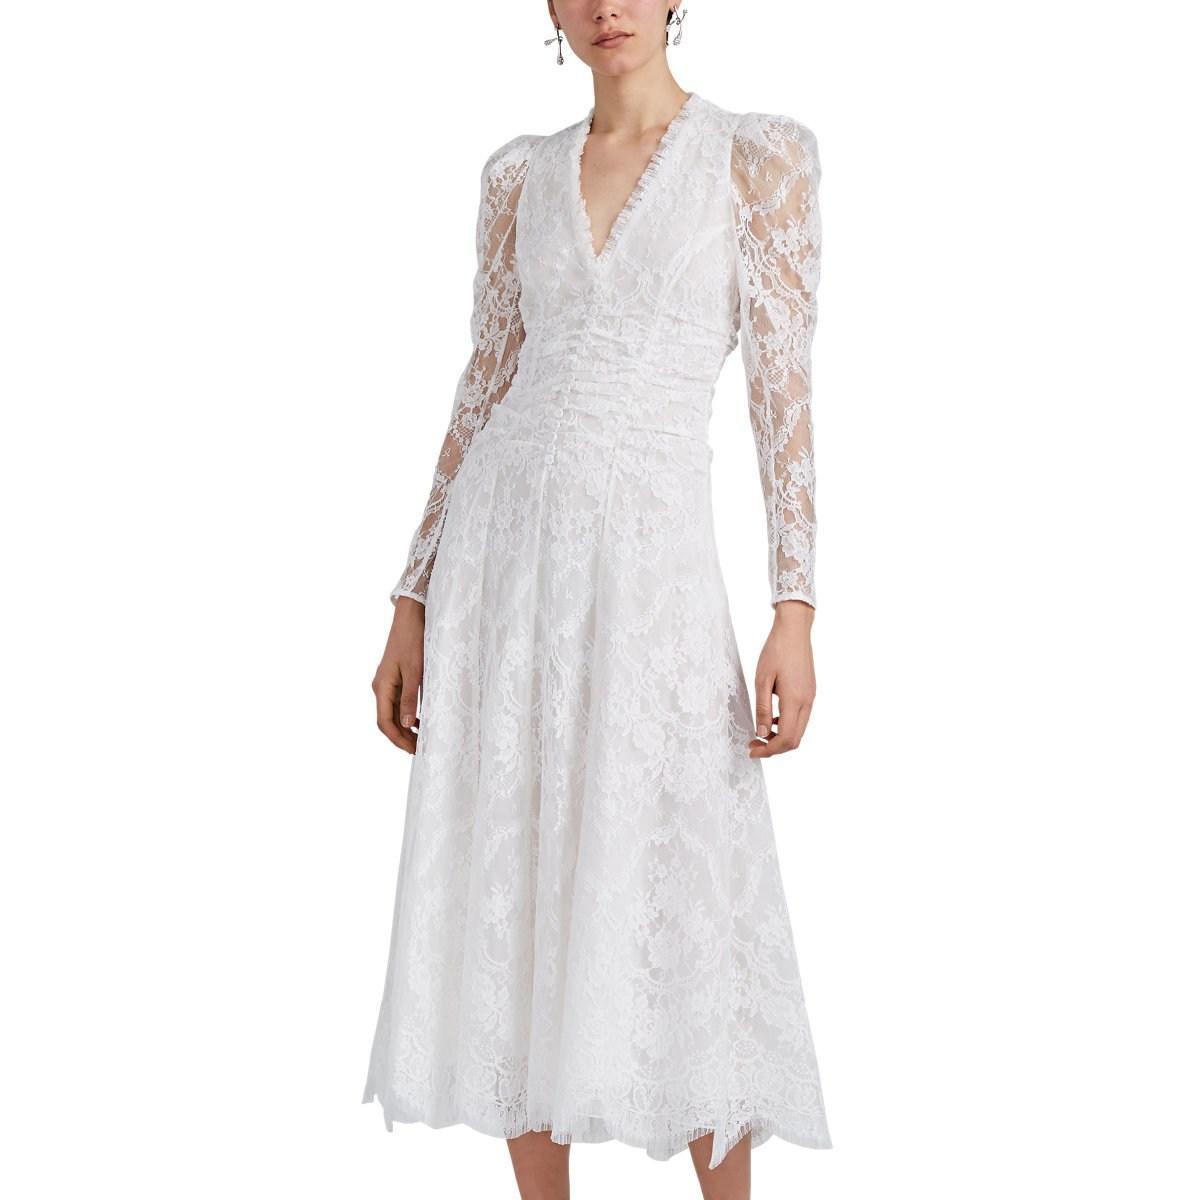 Ireland Floral Lace Dress Ebay 2b477 3f0a1